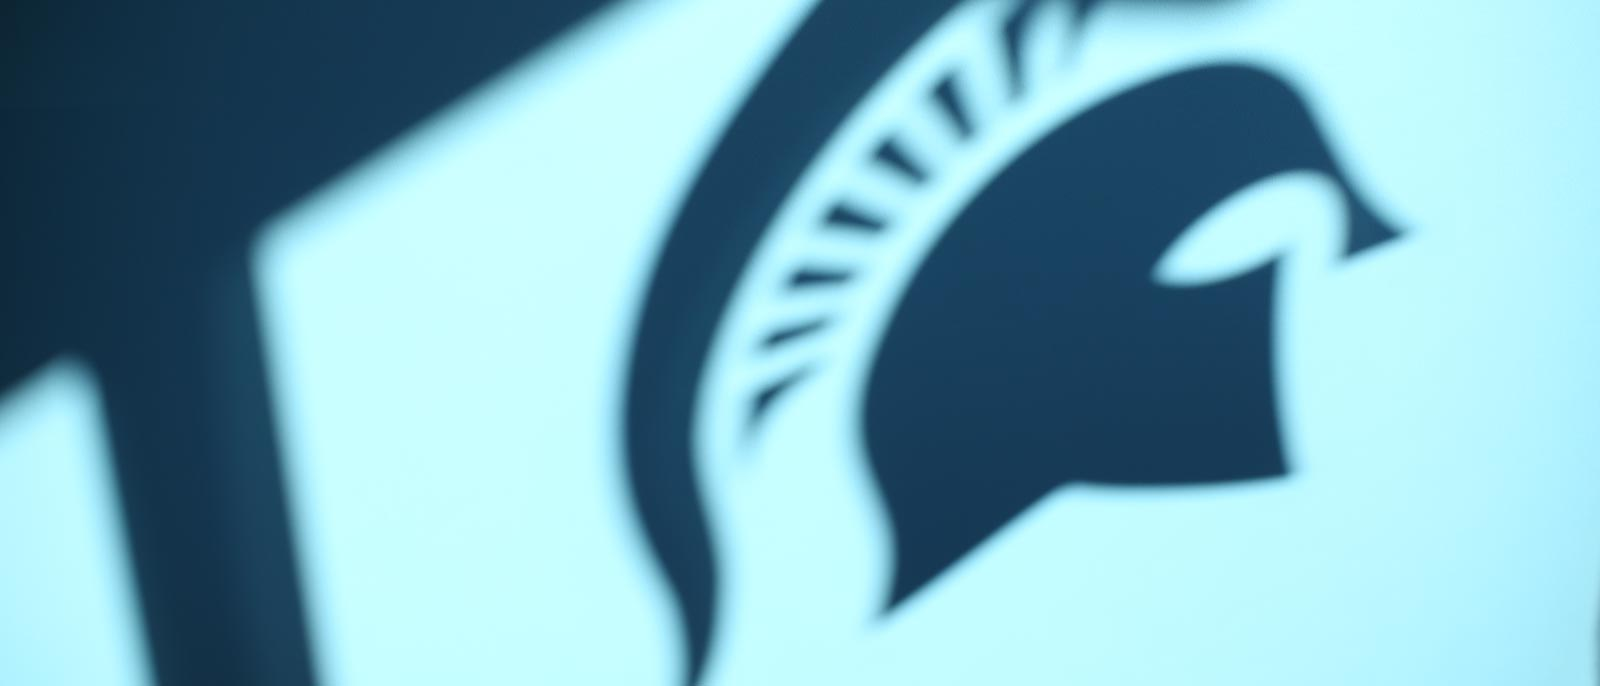 Silhouette of Spartan helmet logo against a lit wall